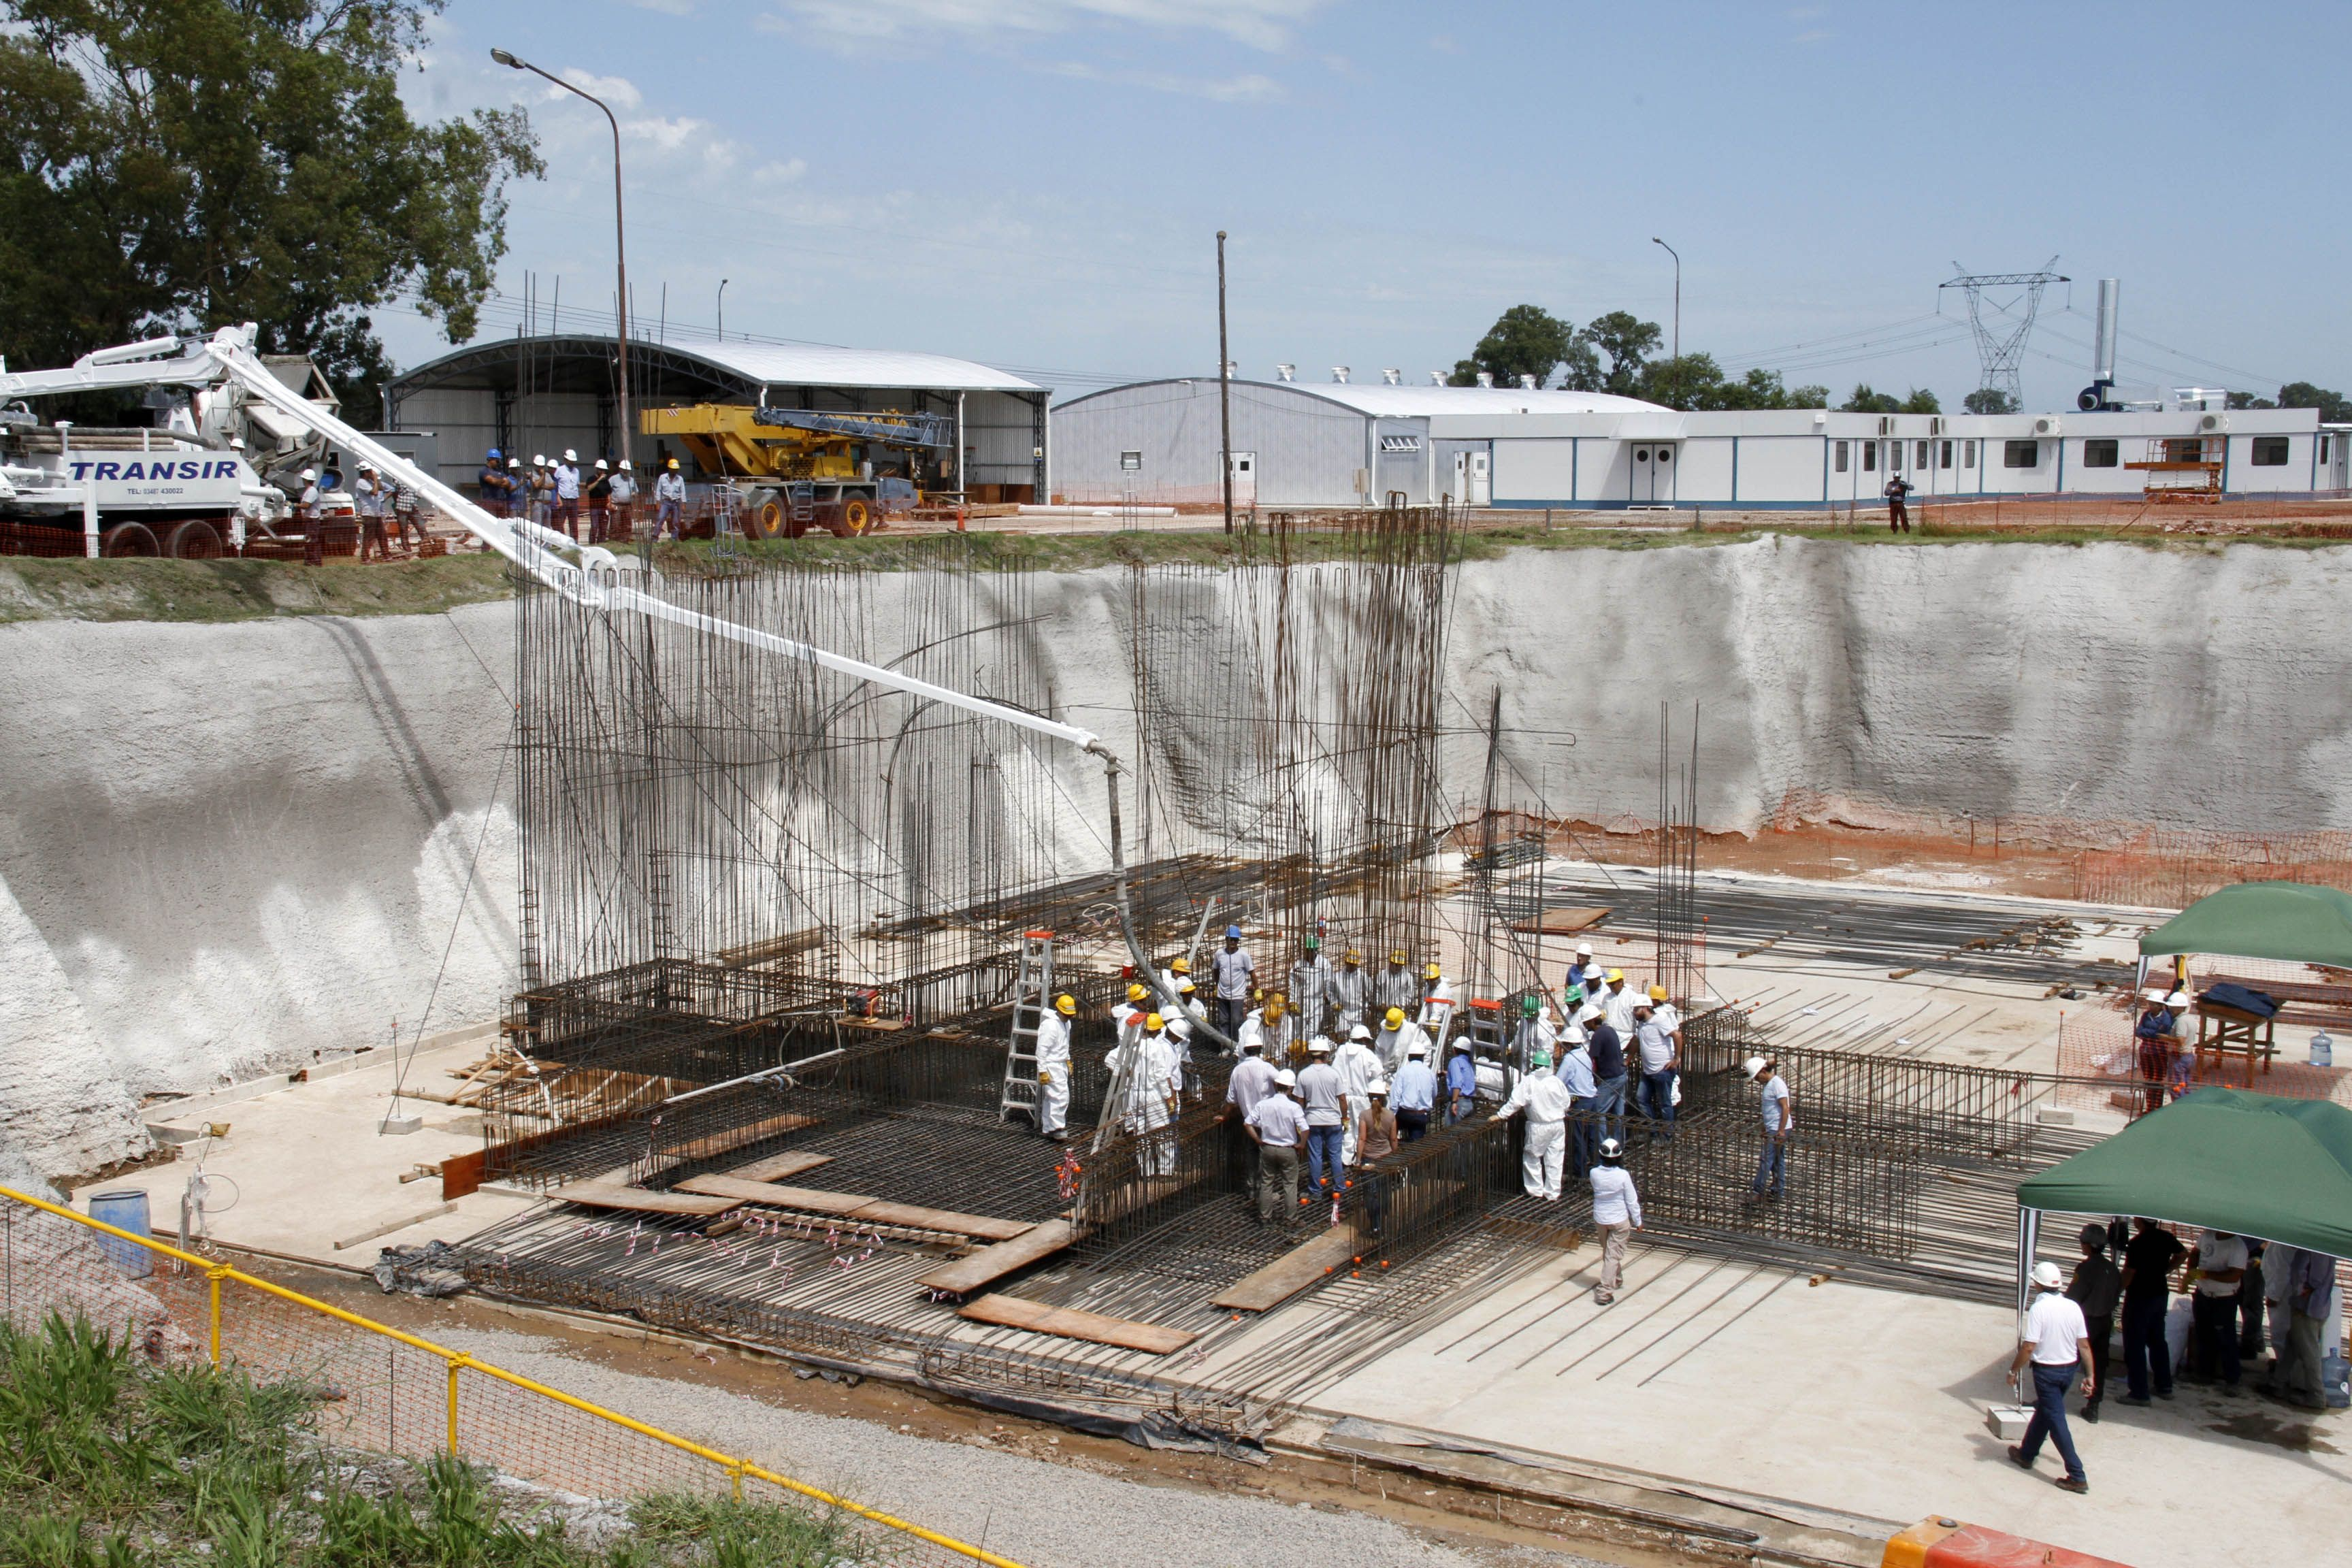 Comenzó la construcción del primer reactor nuclear íntegramente nacional